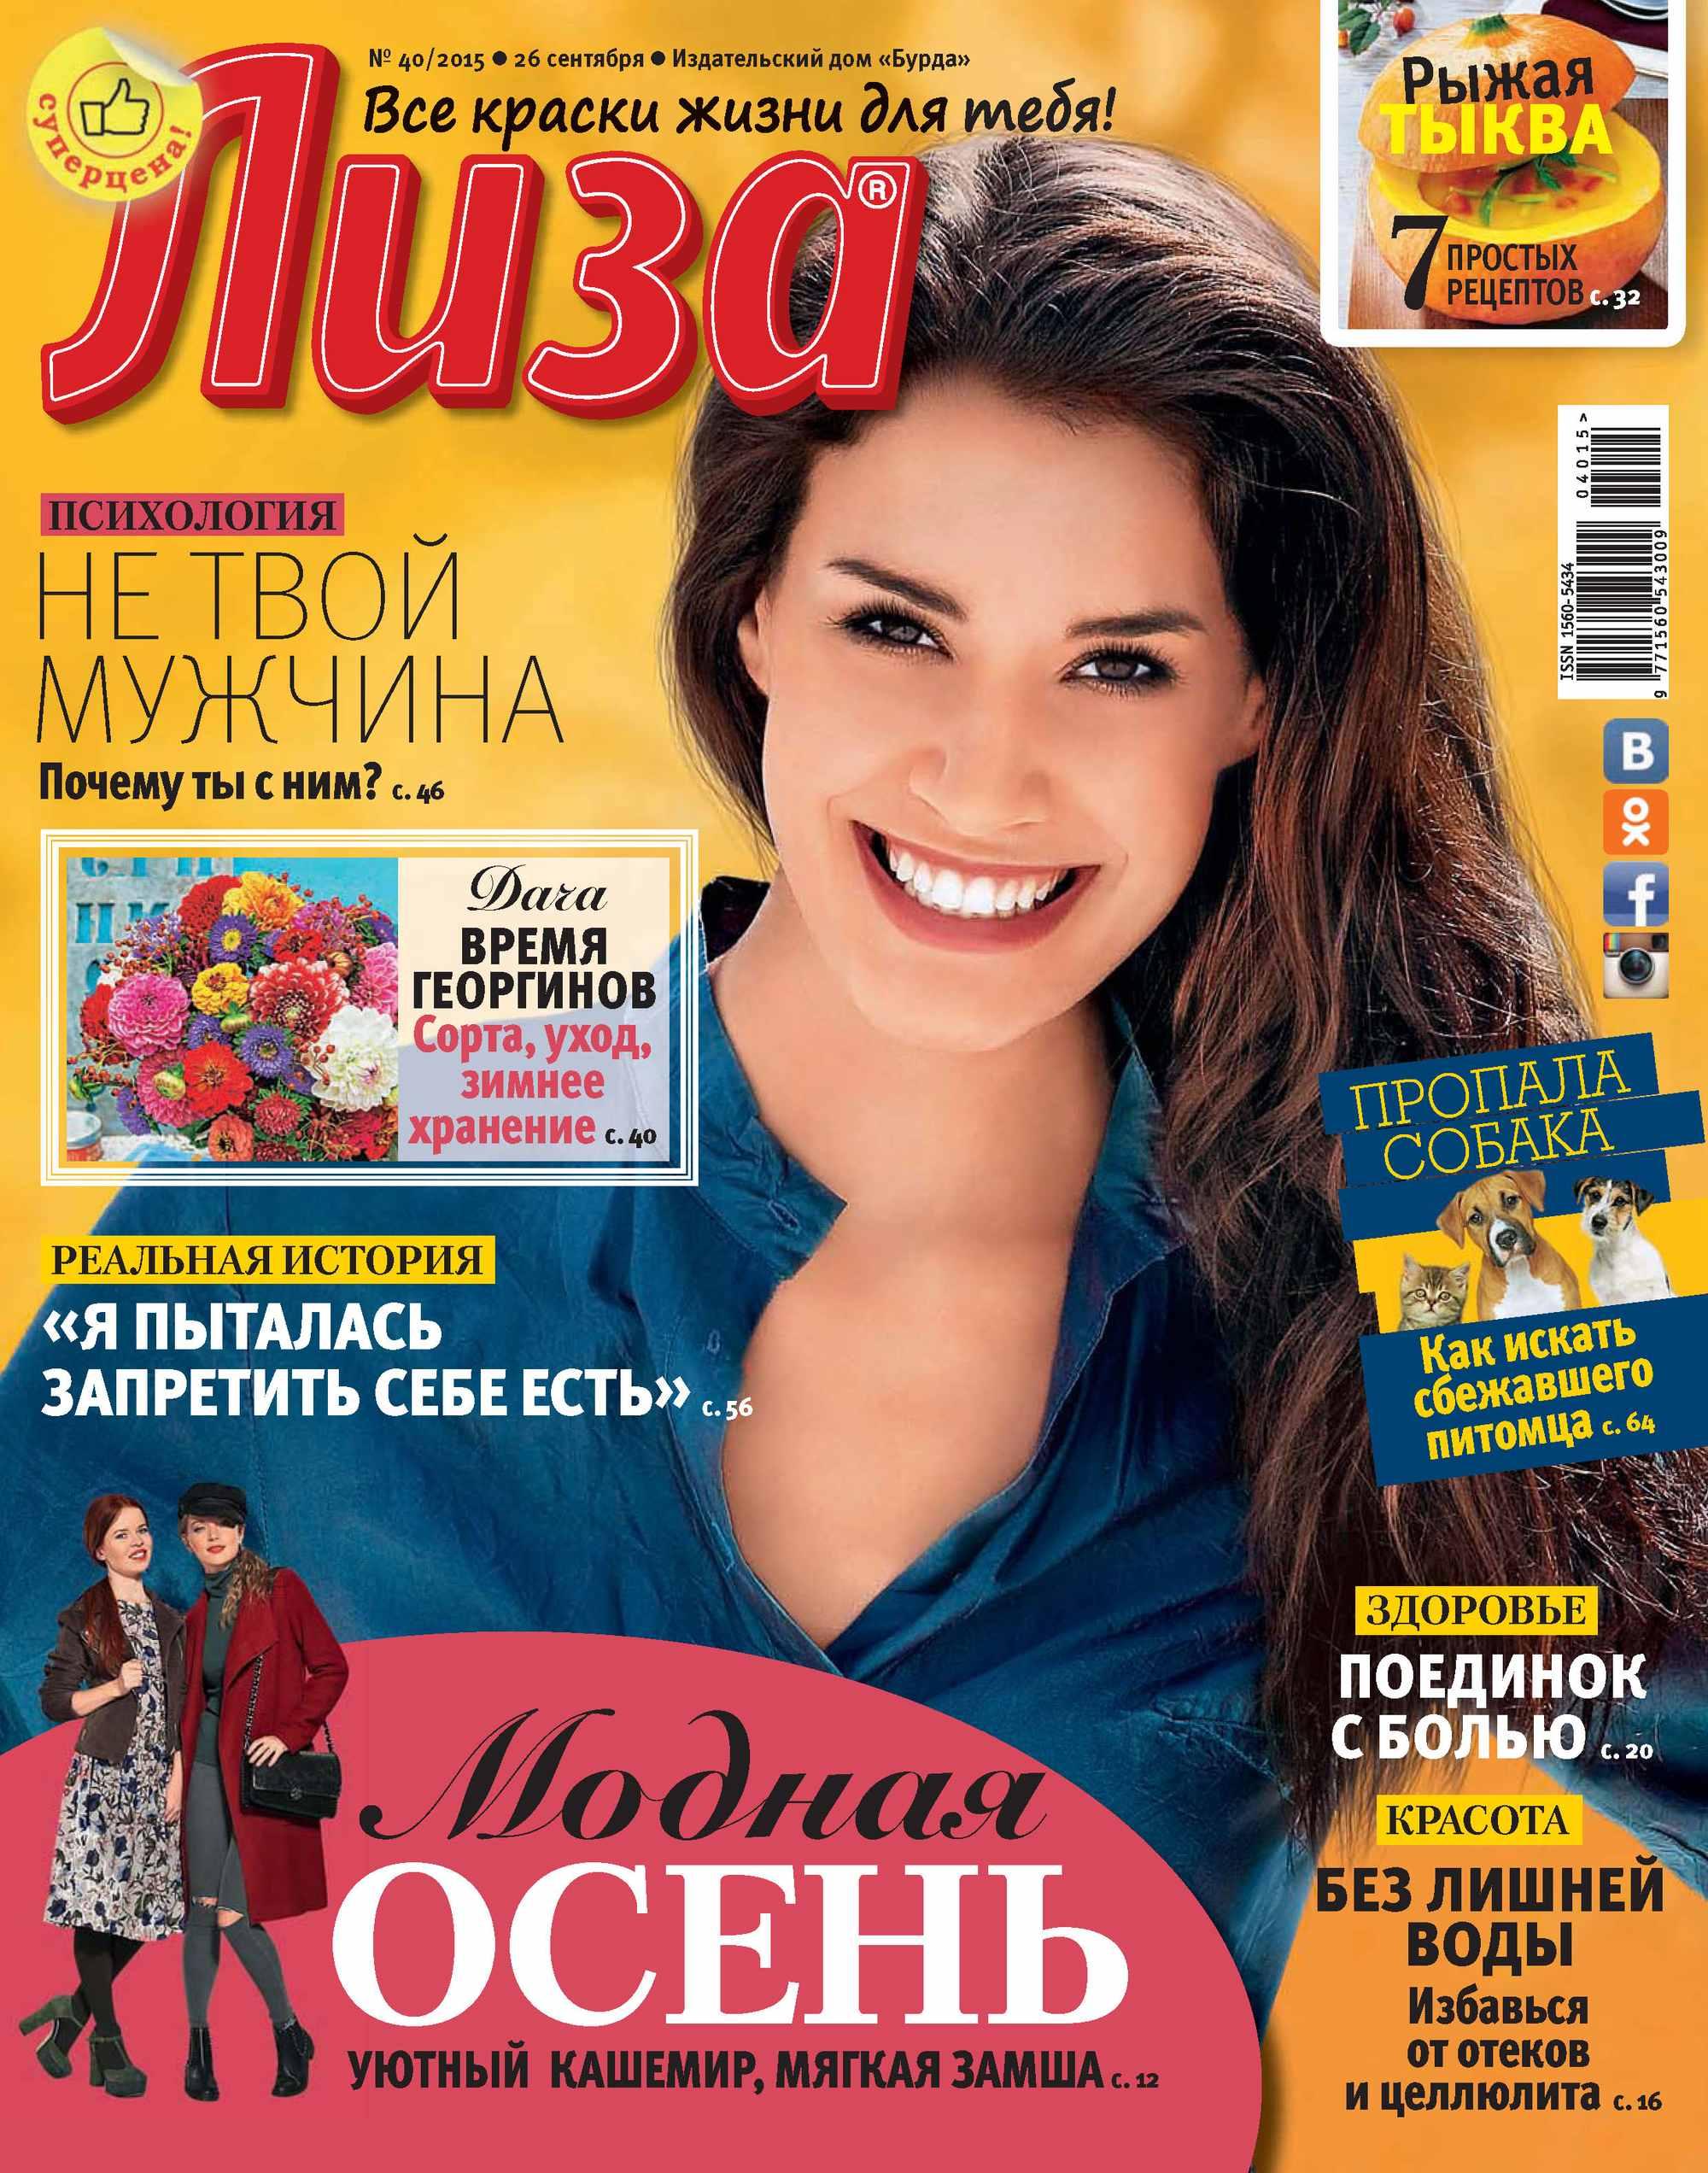 ИД «Бурда» Журнал «Лиза» №40/2015 ид бурда журнал лиза 49 2015